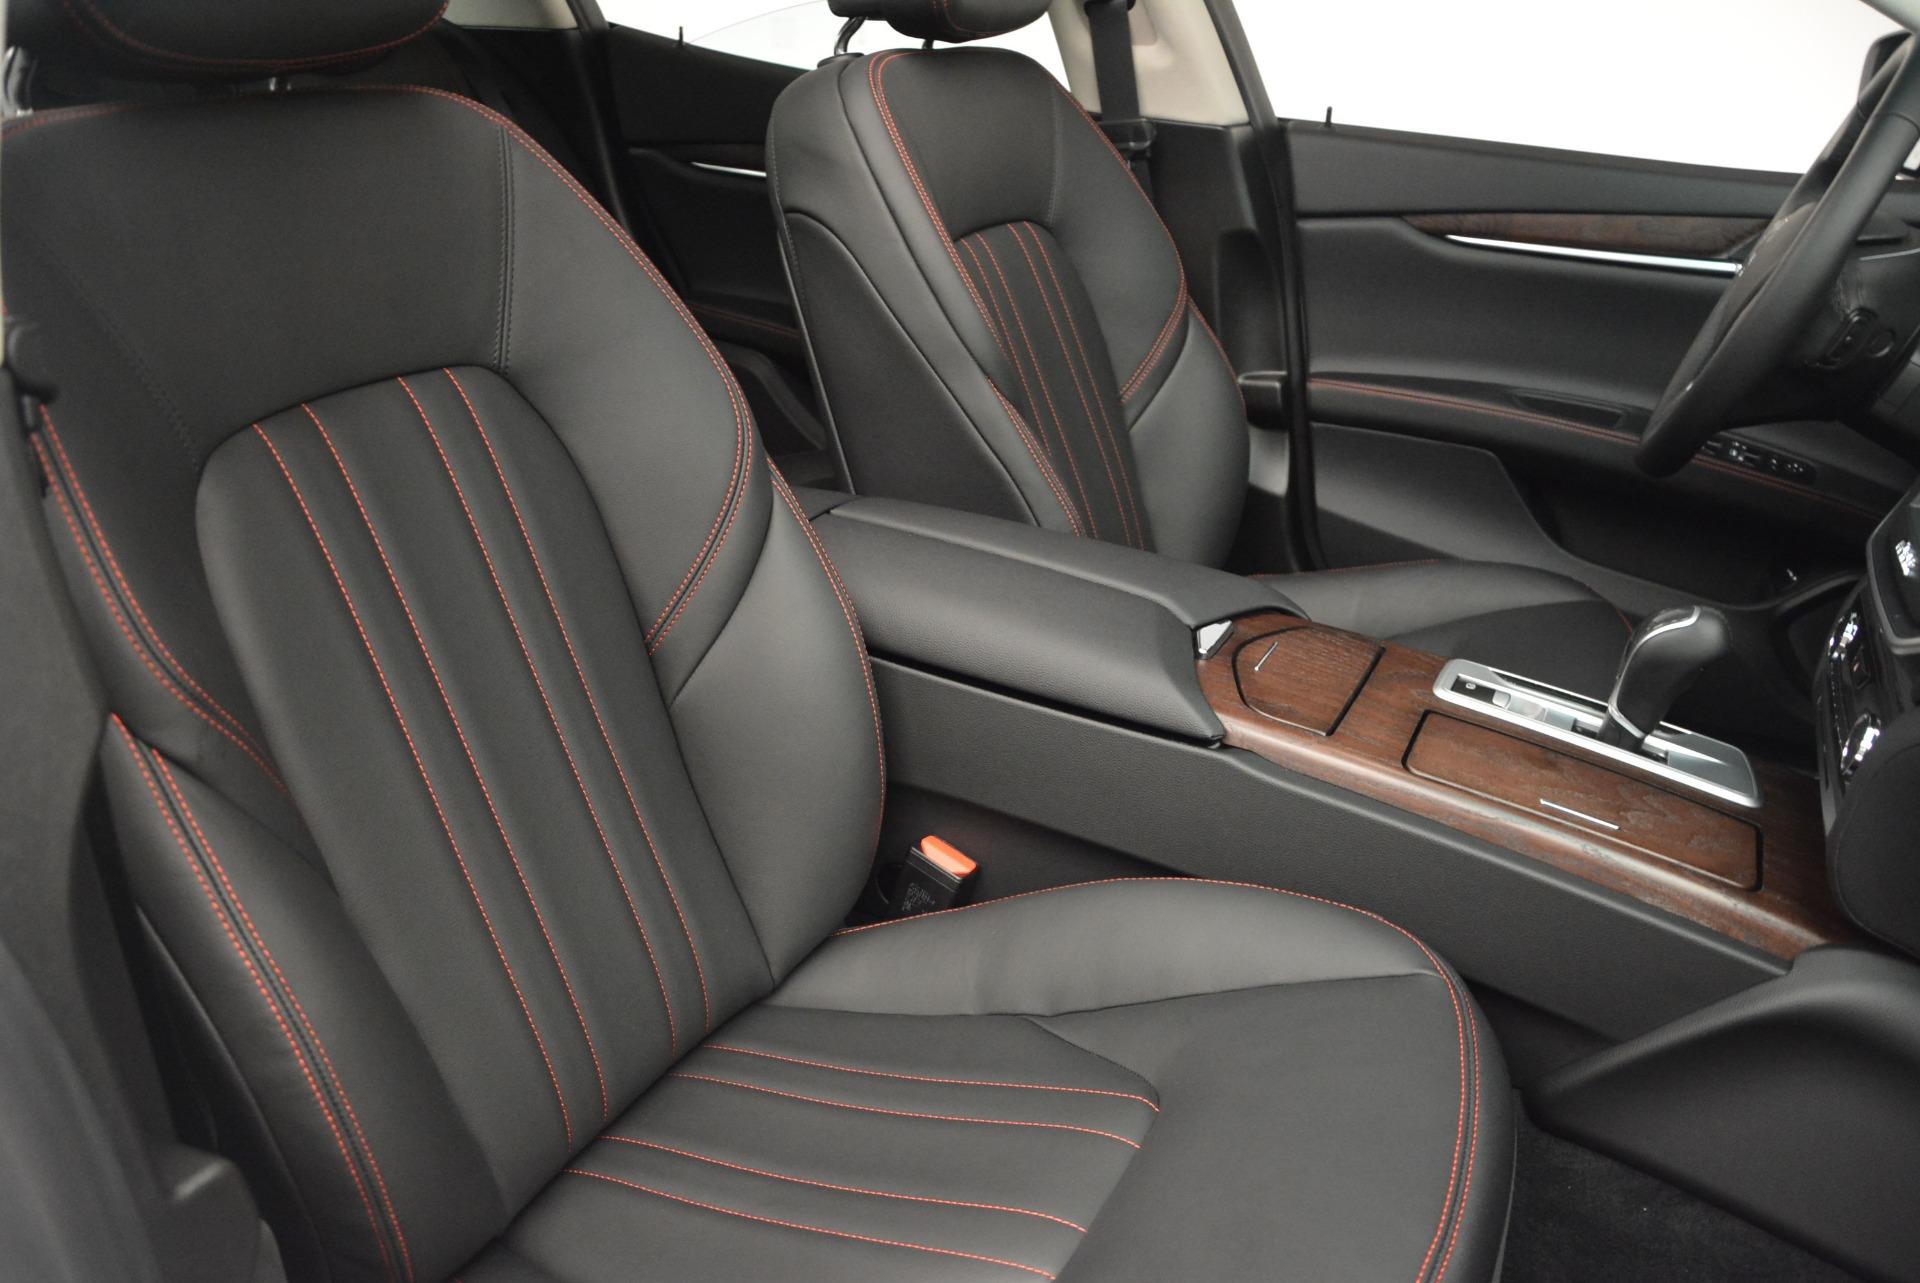 Used 2015 Maserati Ghibli S Q4 For Sale In Westport, CT 2070_p19